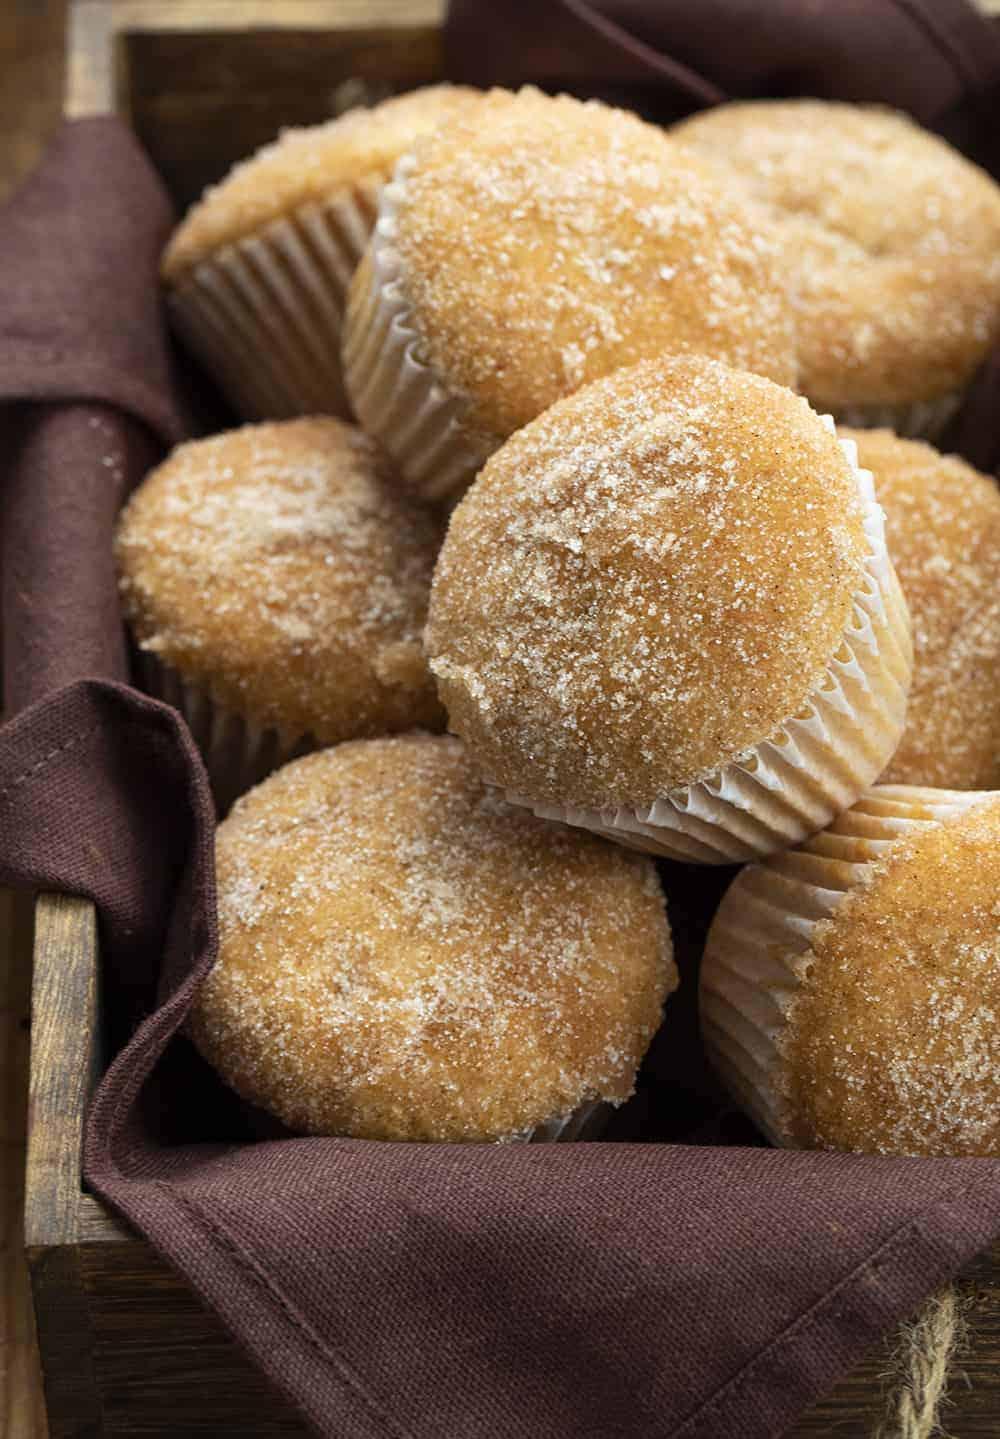 https://iambaker.net/wp-content/uploads/2020/11/apple-cider-muffin-2.jpg